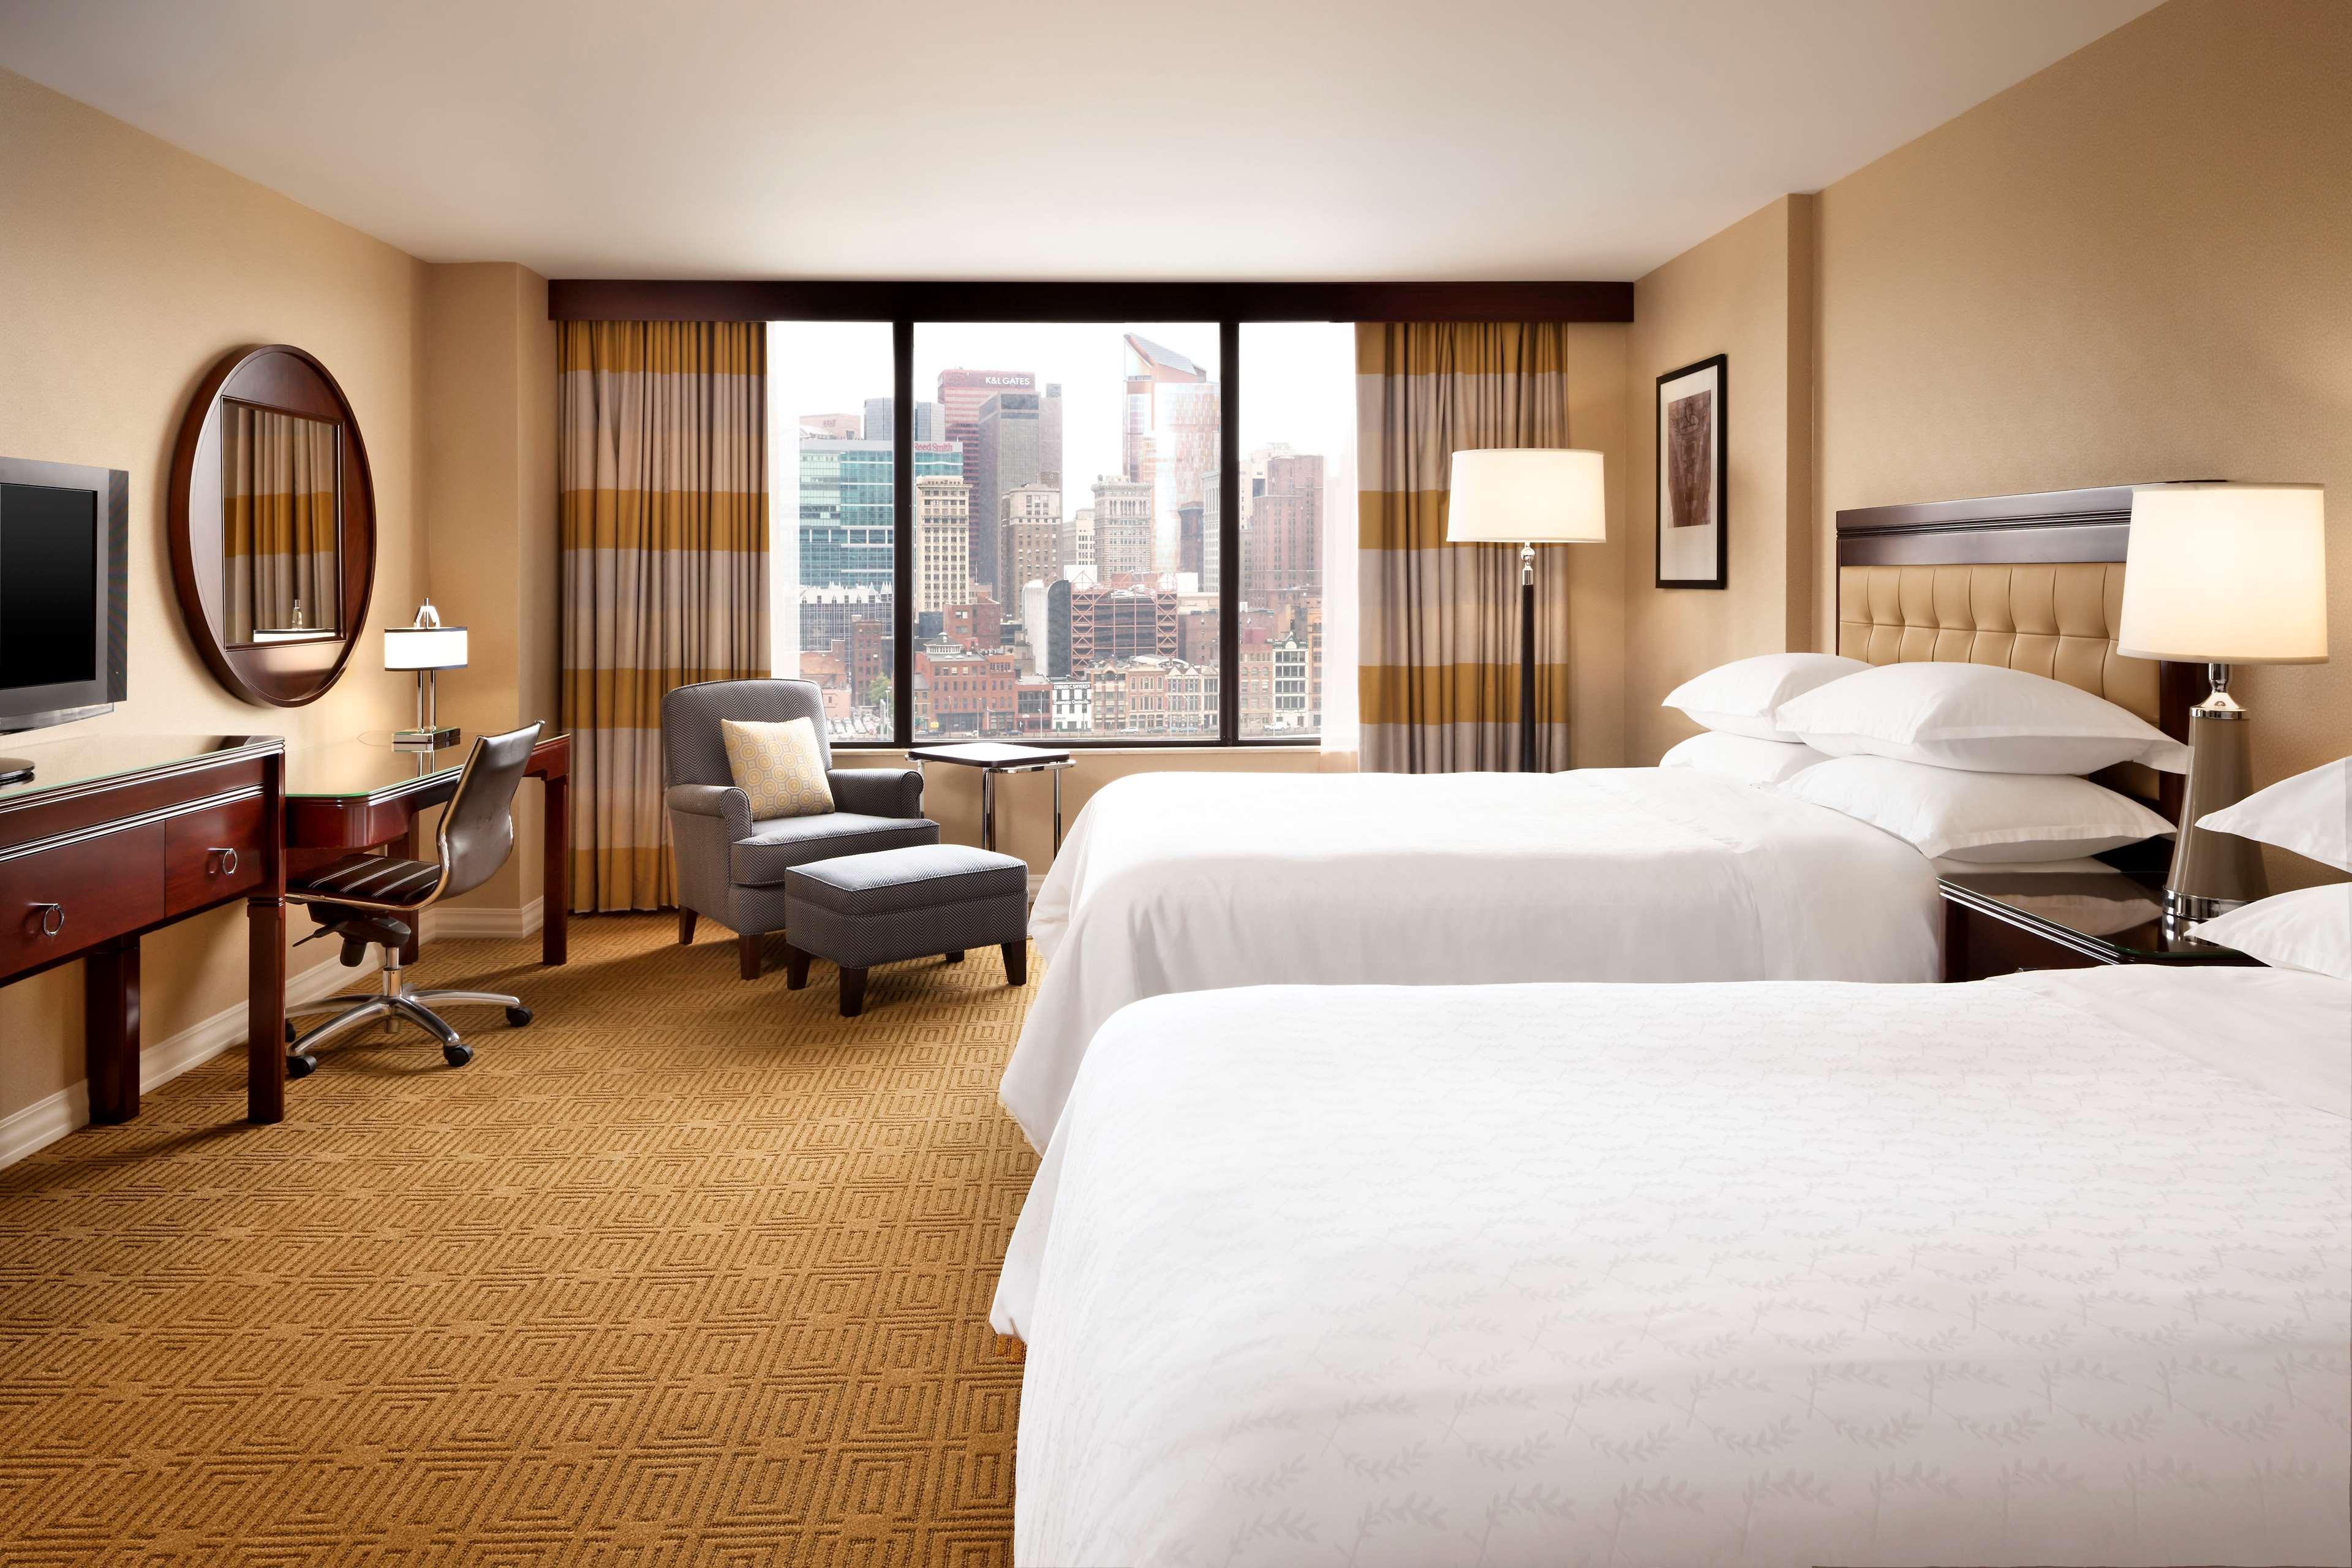 Sheraton Pittsburgh Hotel at Station Square image 14